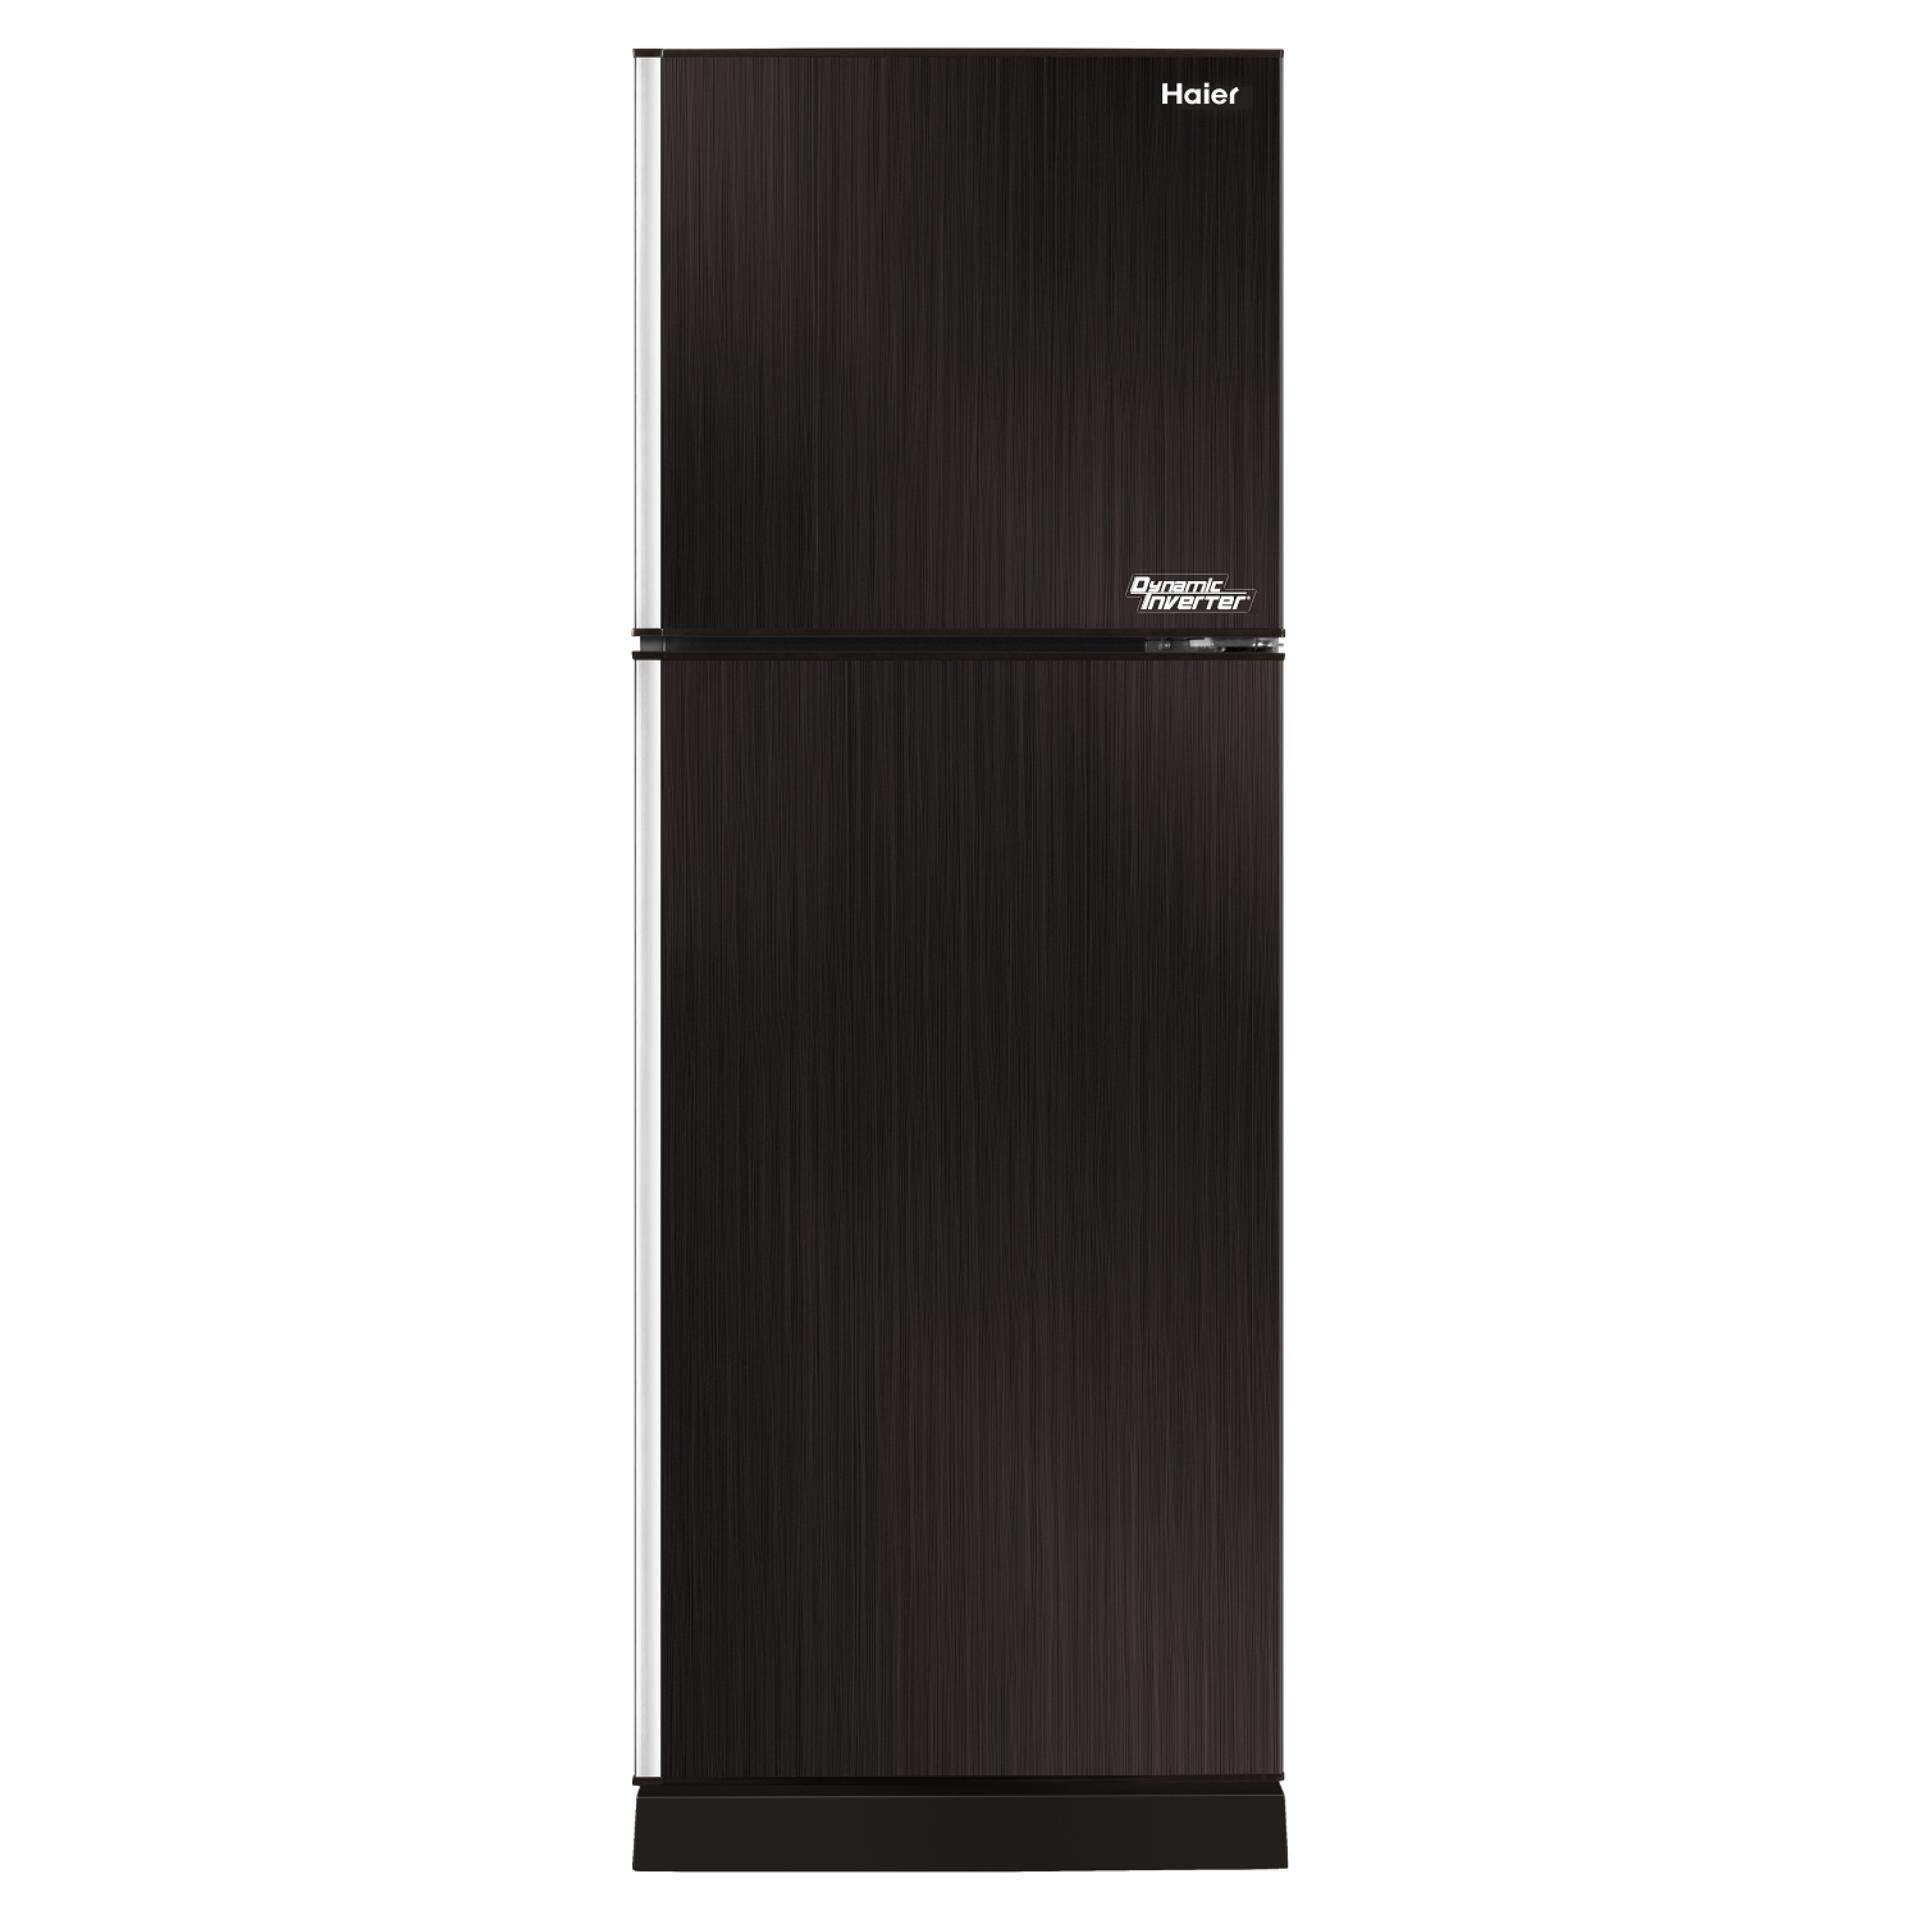 Haier ตู้เย็น 2 ประตู Dynamic Inverter รุ่น Hrf Tmv227 Mb ขนาด 7 2 คิว 225 ลิตร ถูก